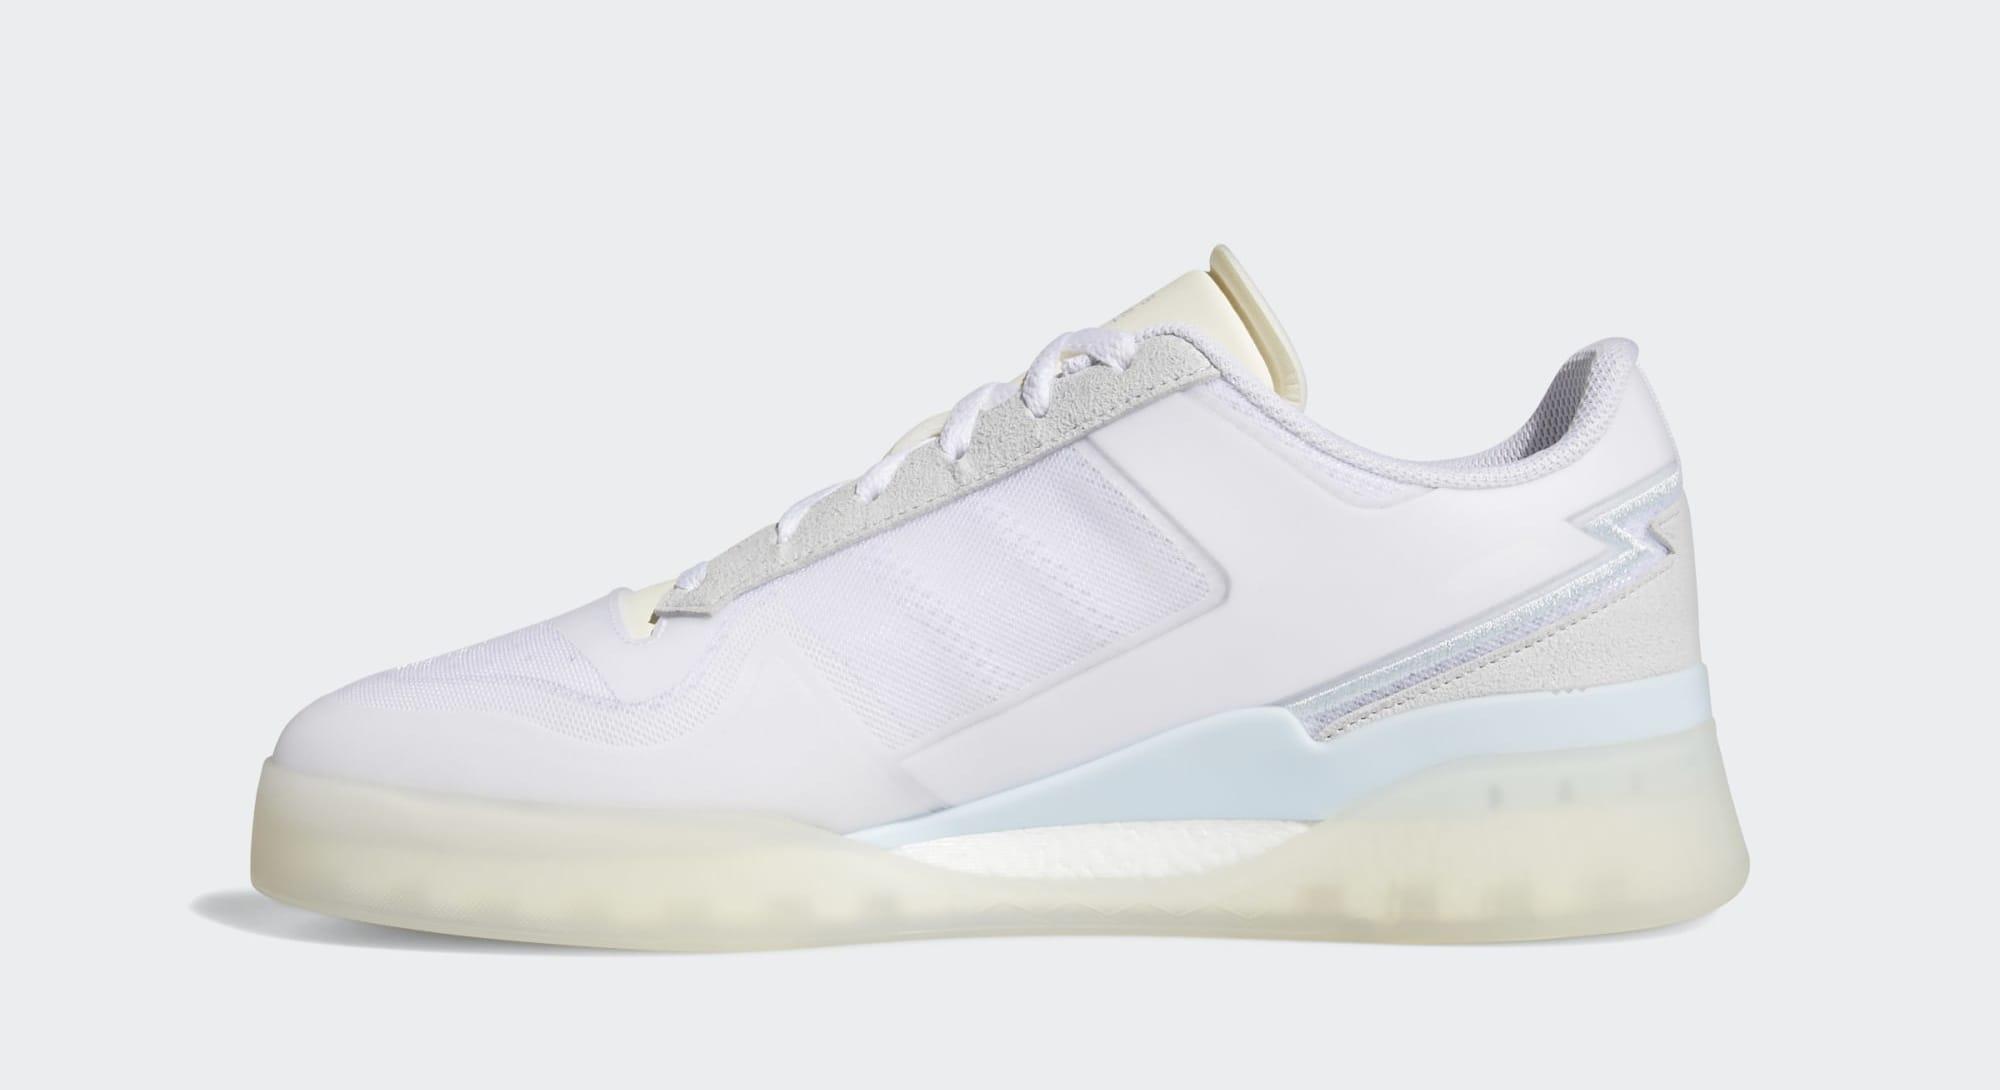 Adidas Forum Low Tech Boost 'Cloud White' Q46357 Medial